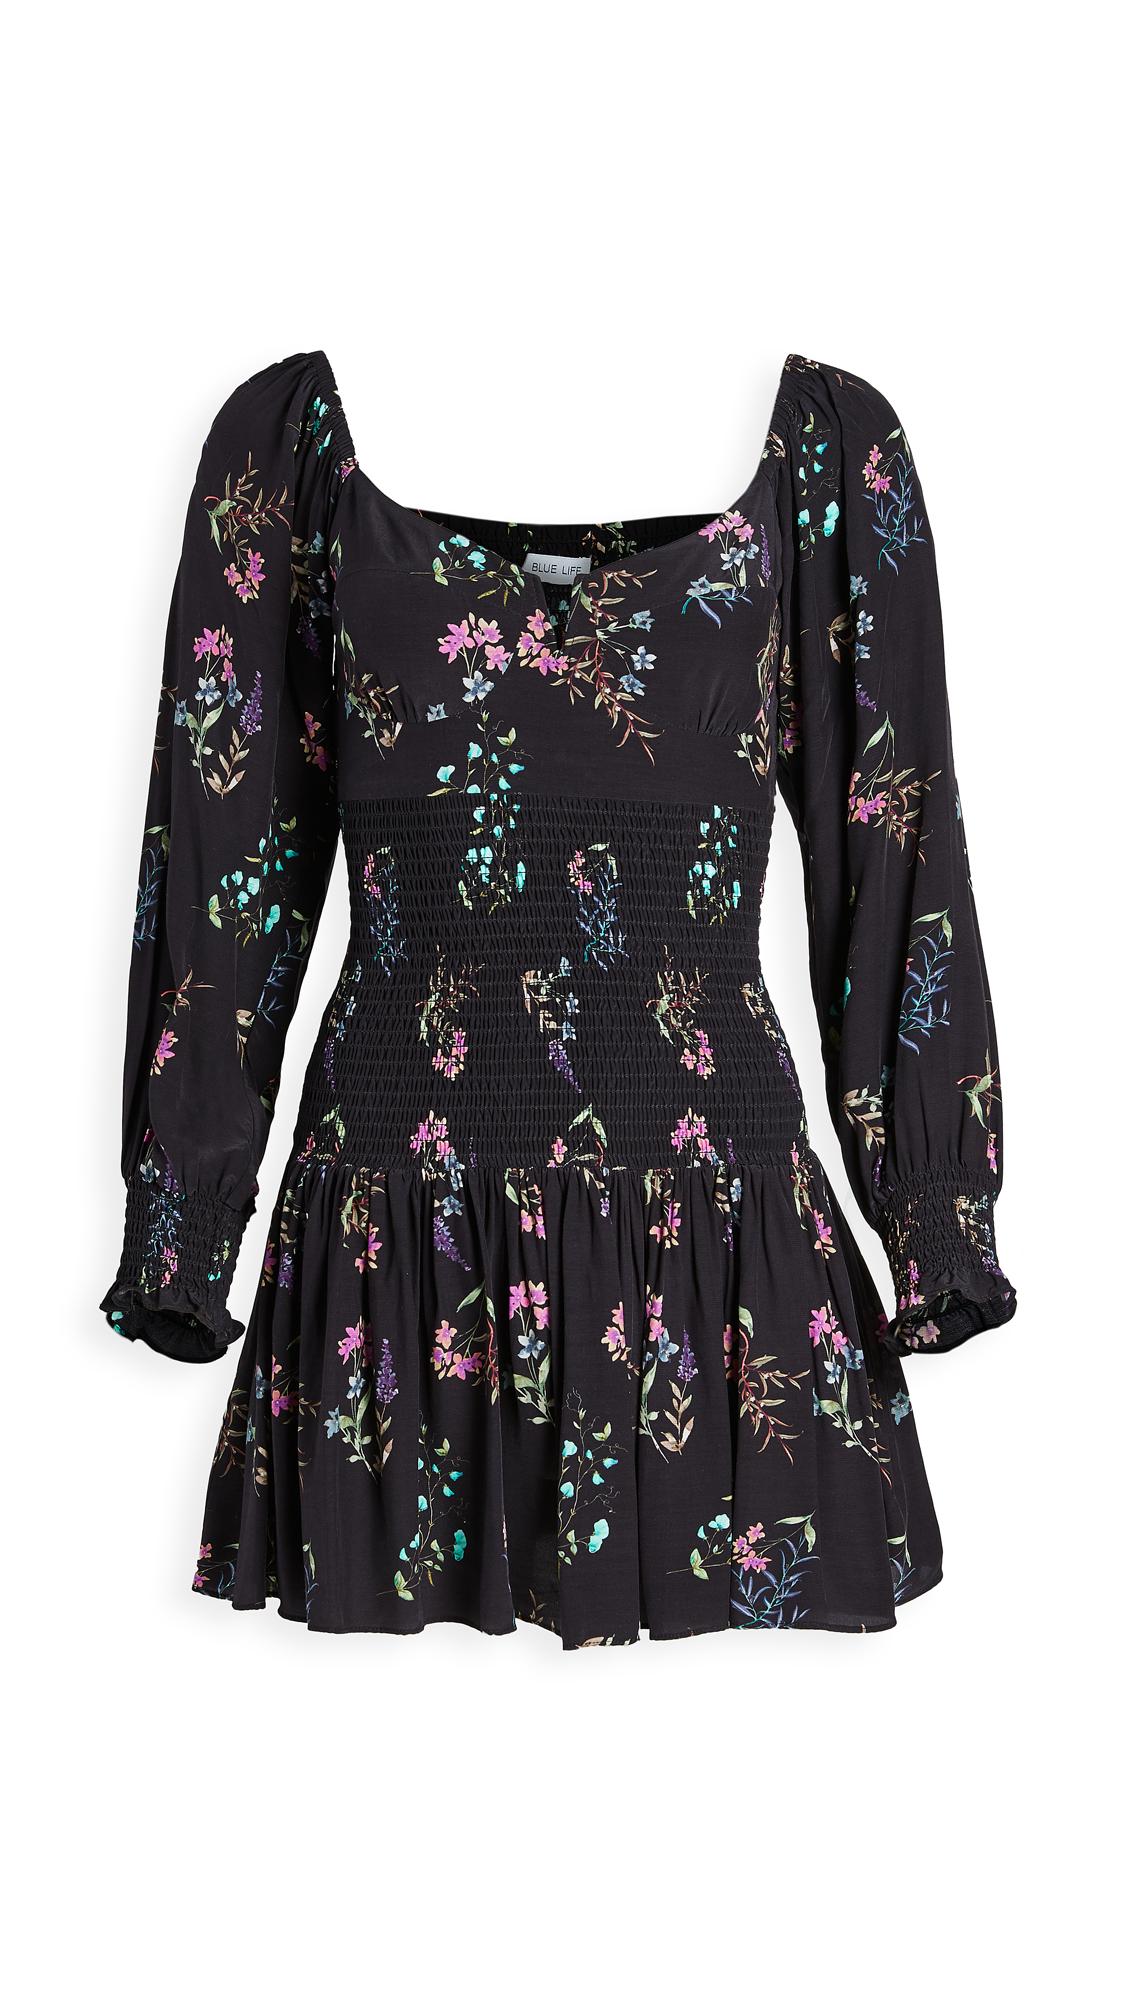 Blue Life Sasha Dress - 30% Off Sale